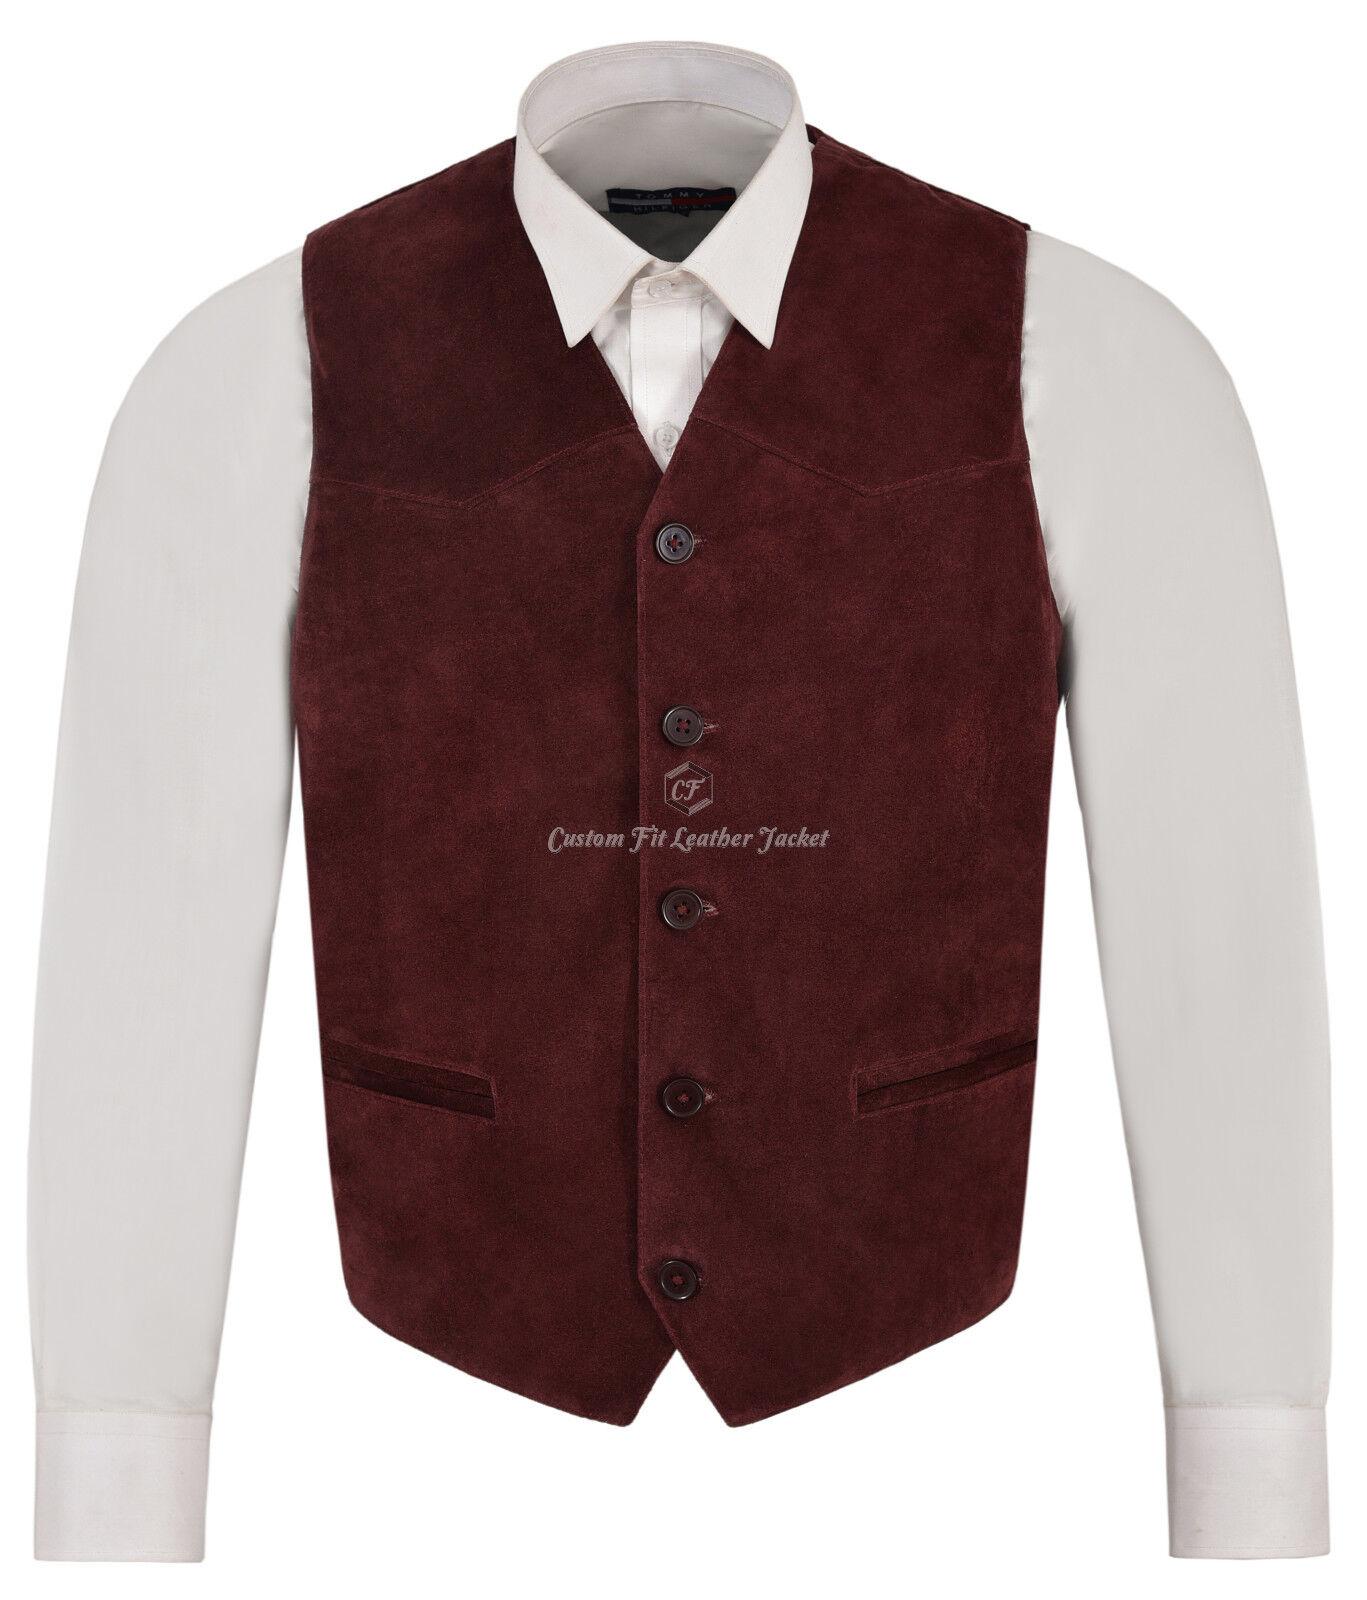 Herren Cherry Suede Real Leder Waistcoat Western Cowboy Festival Party Vest ZARA